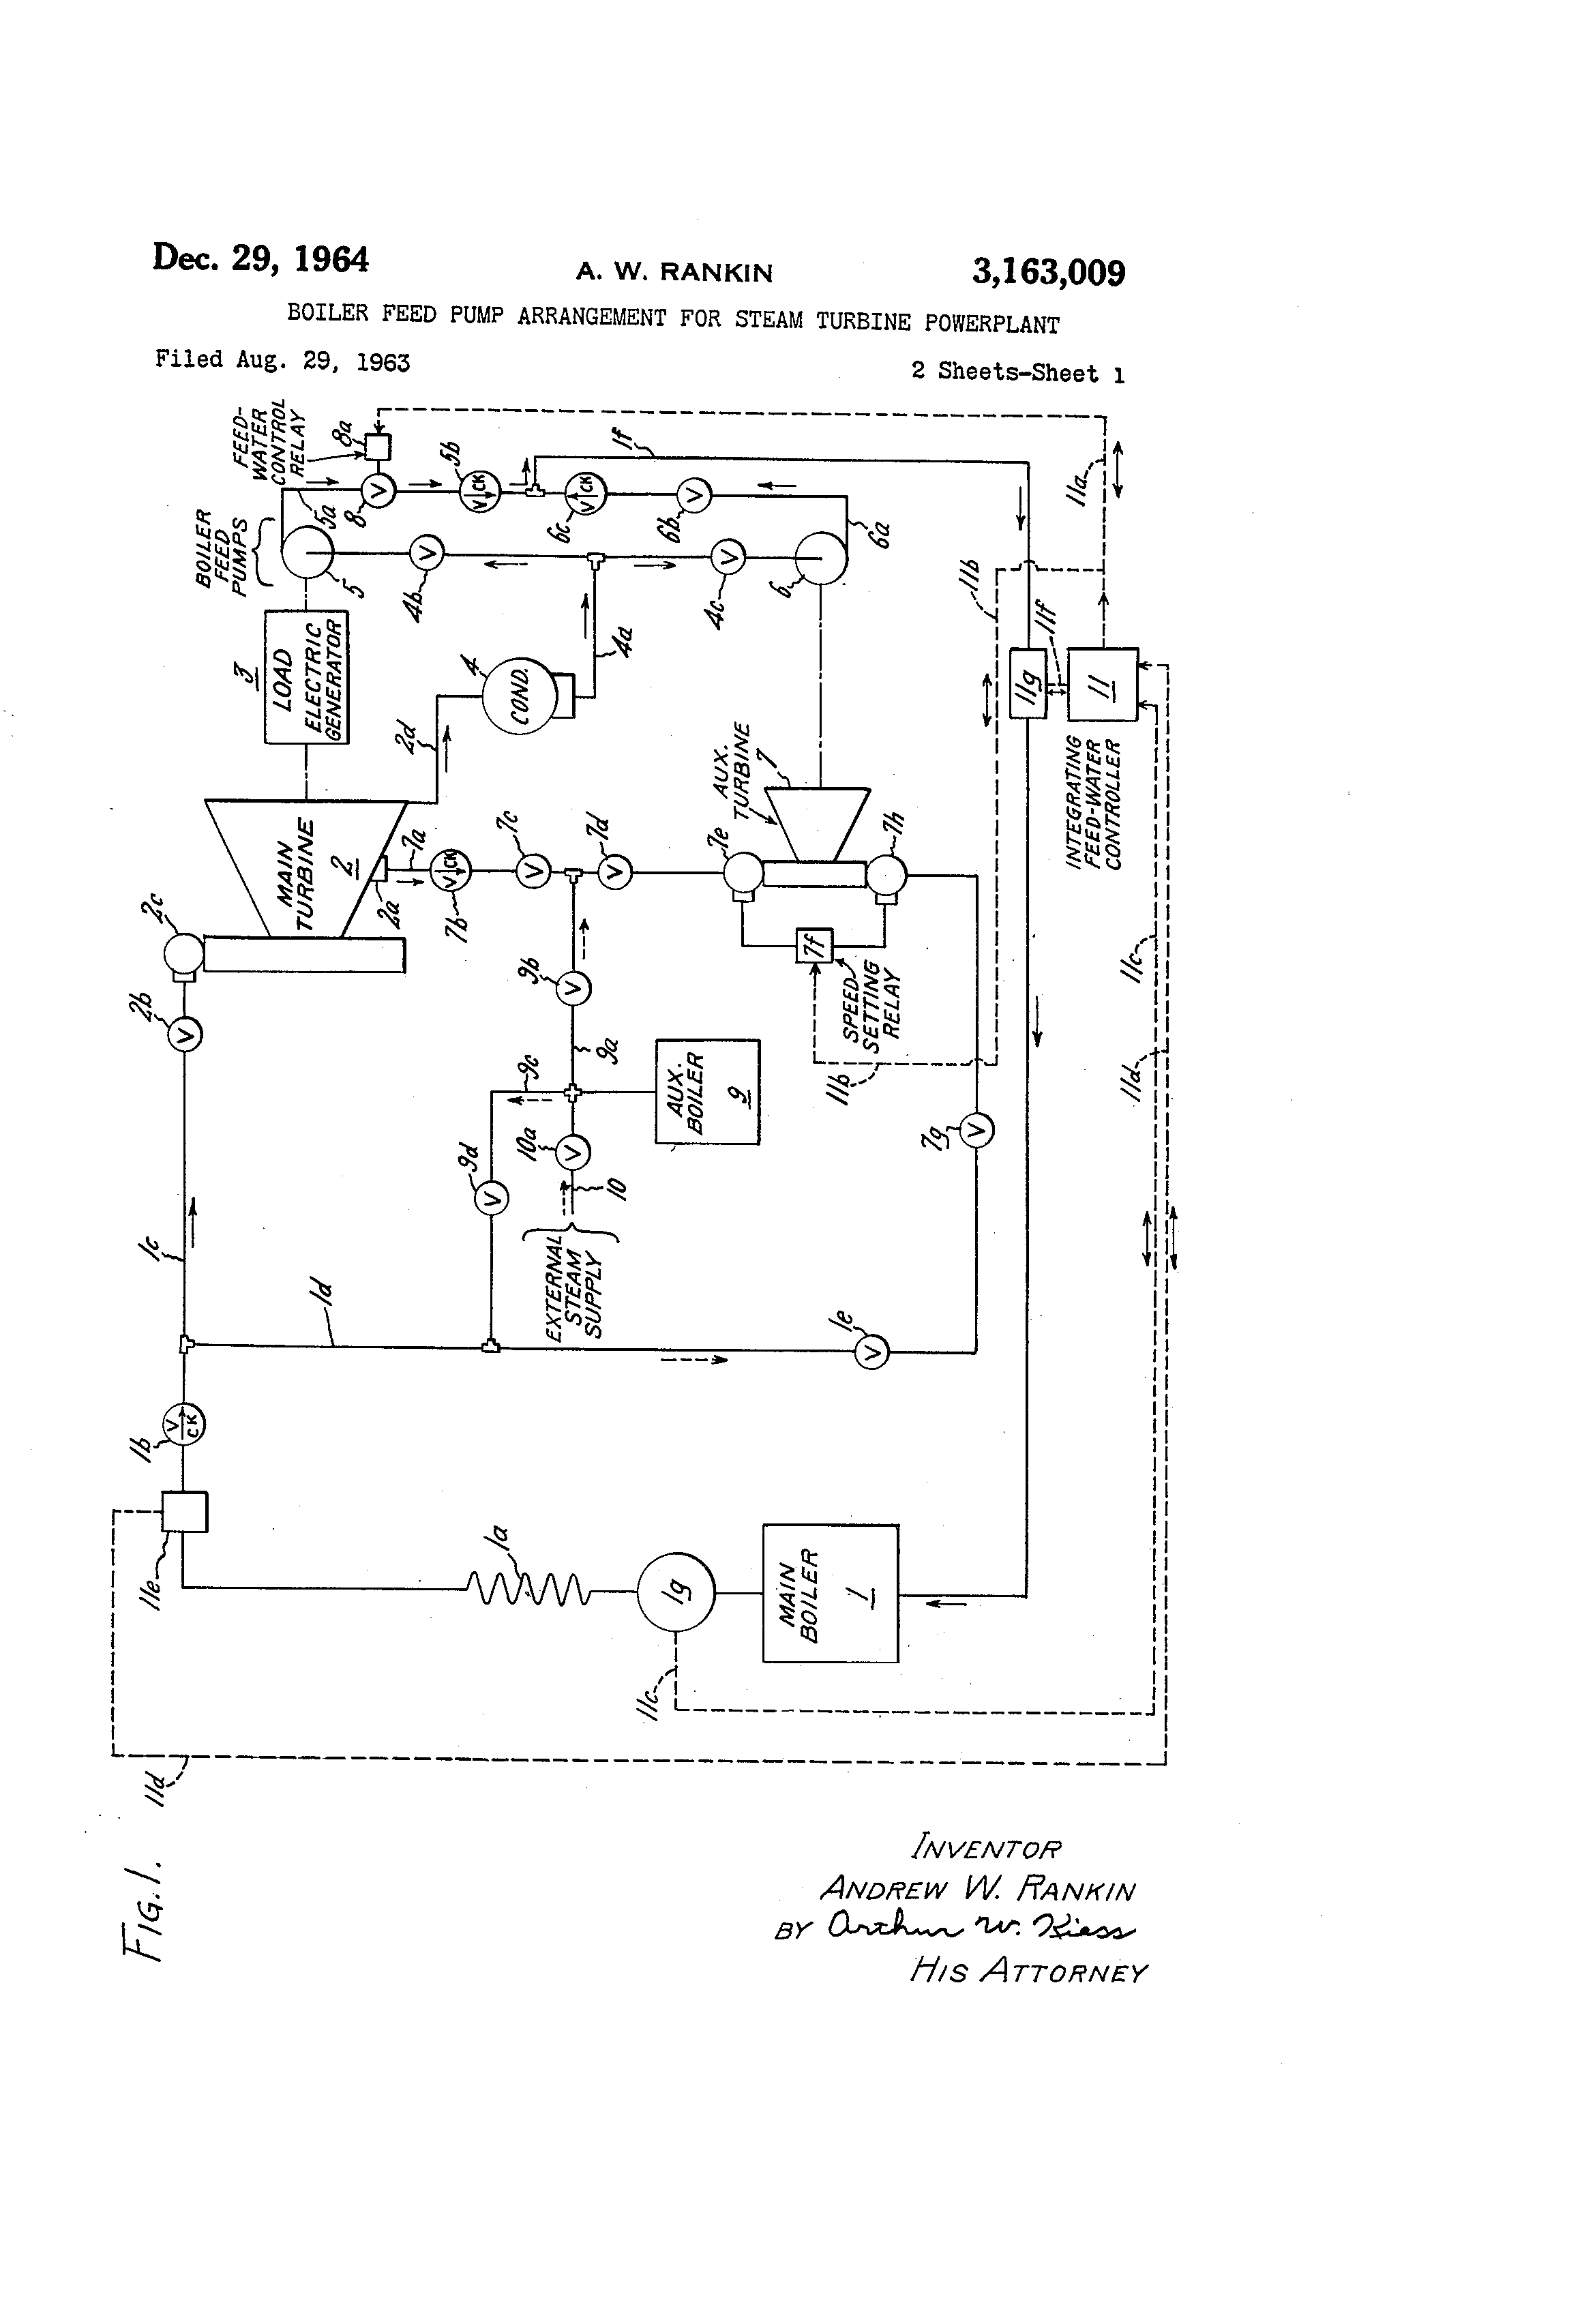 Patent US Boiler feed pump arrangement for steam turbine